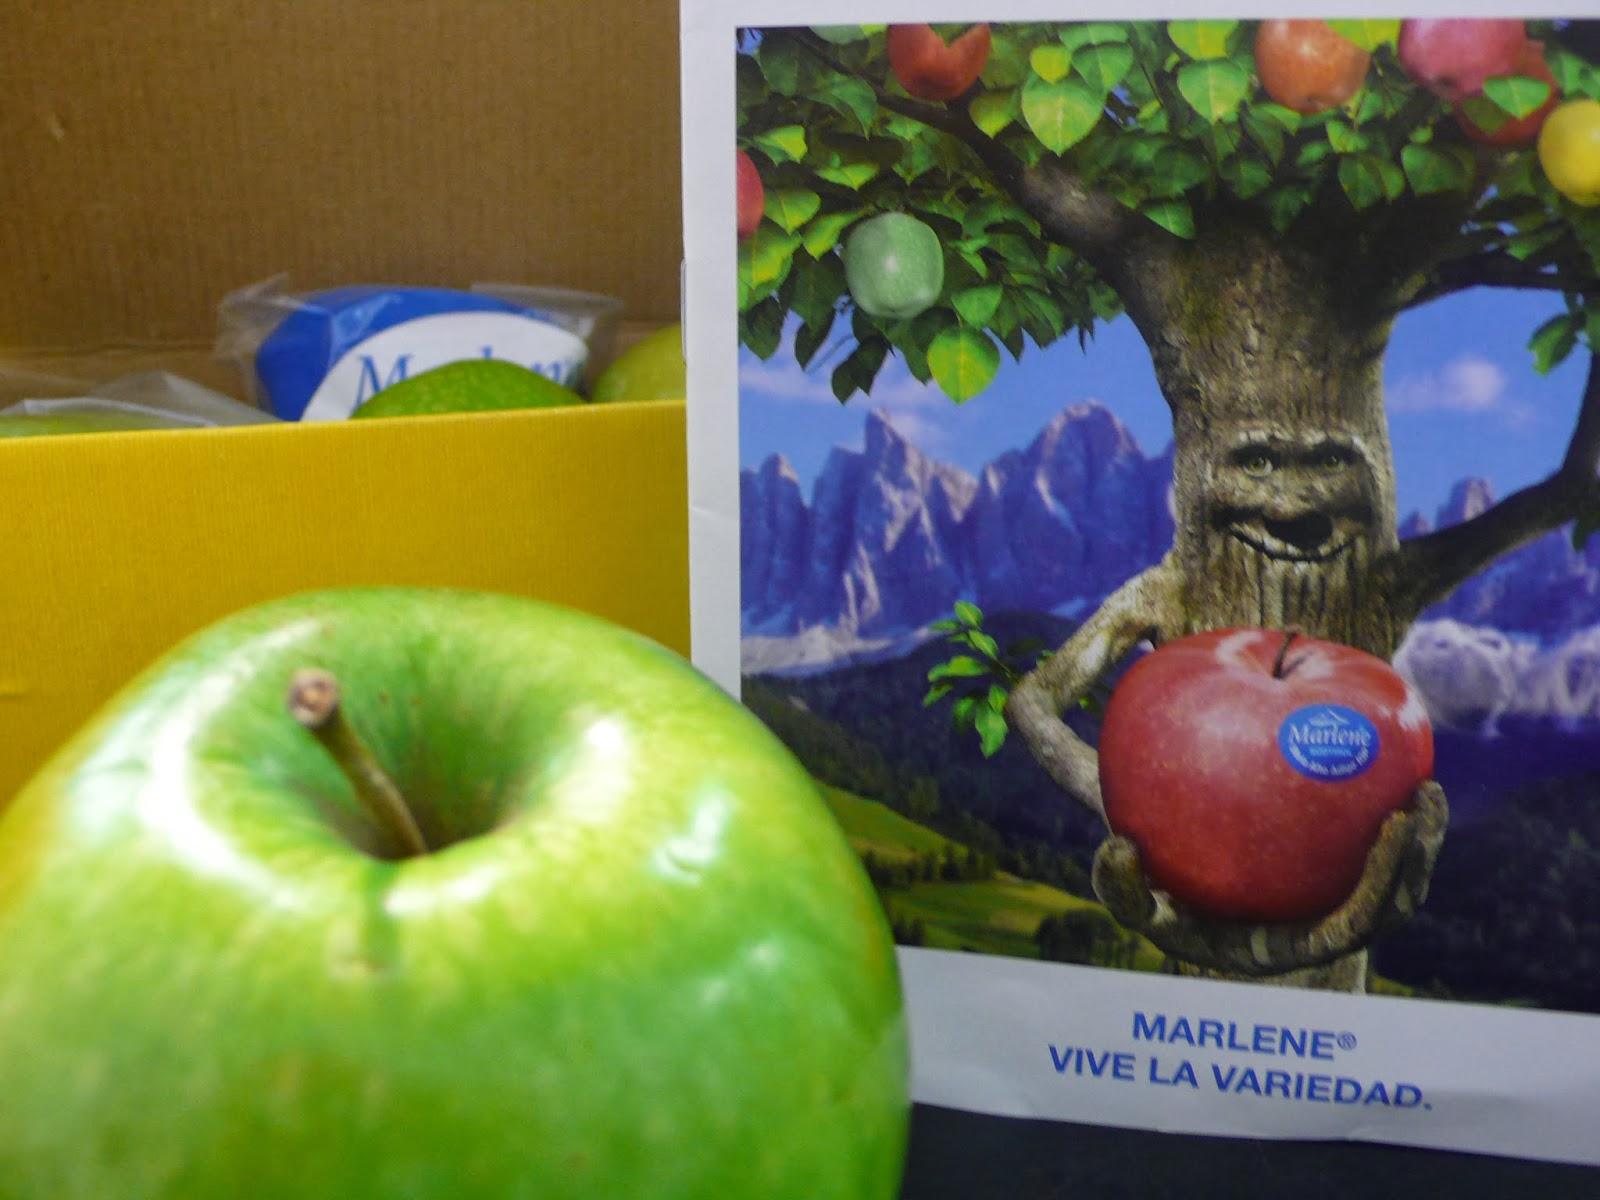 http://www.marlene.it/es/nuestras-manzanas/variedades-de-marlene/royal-gala.html